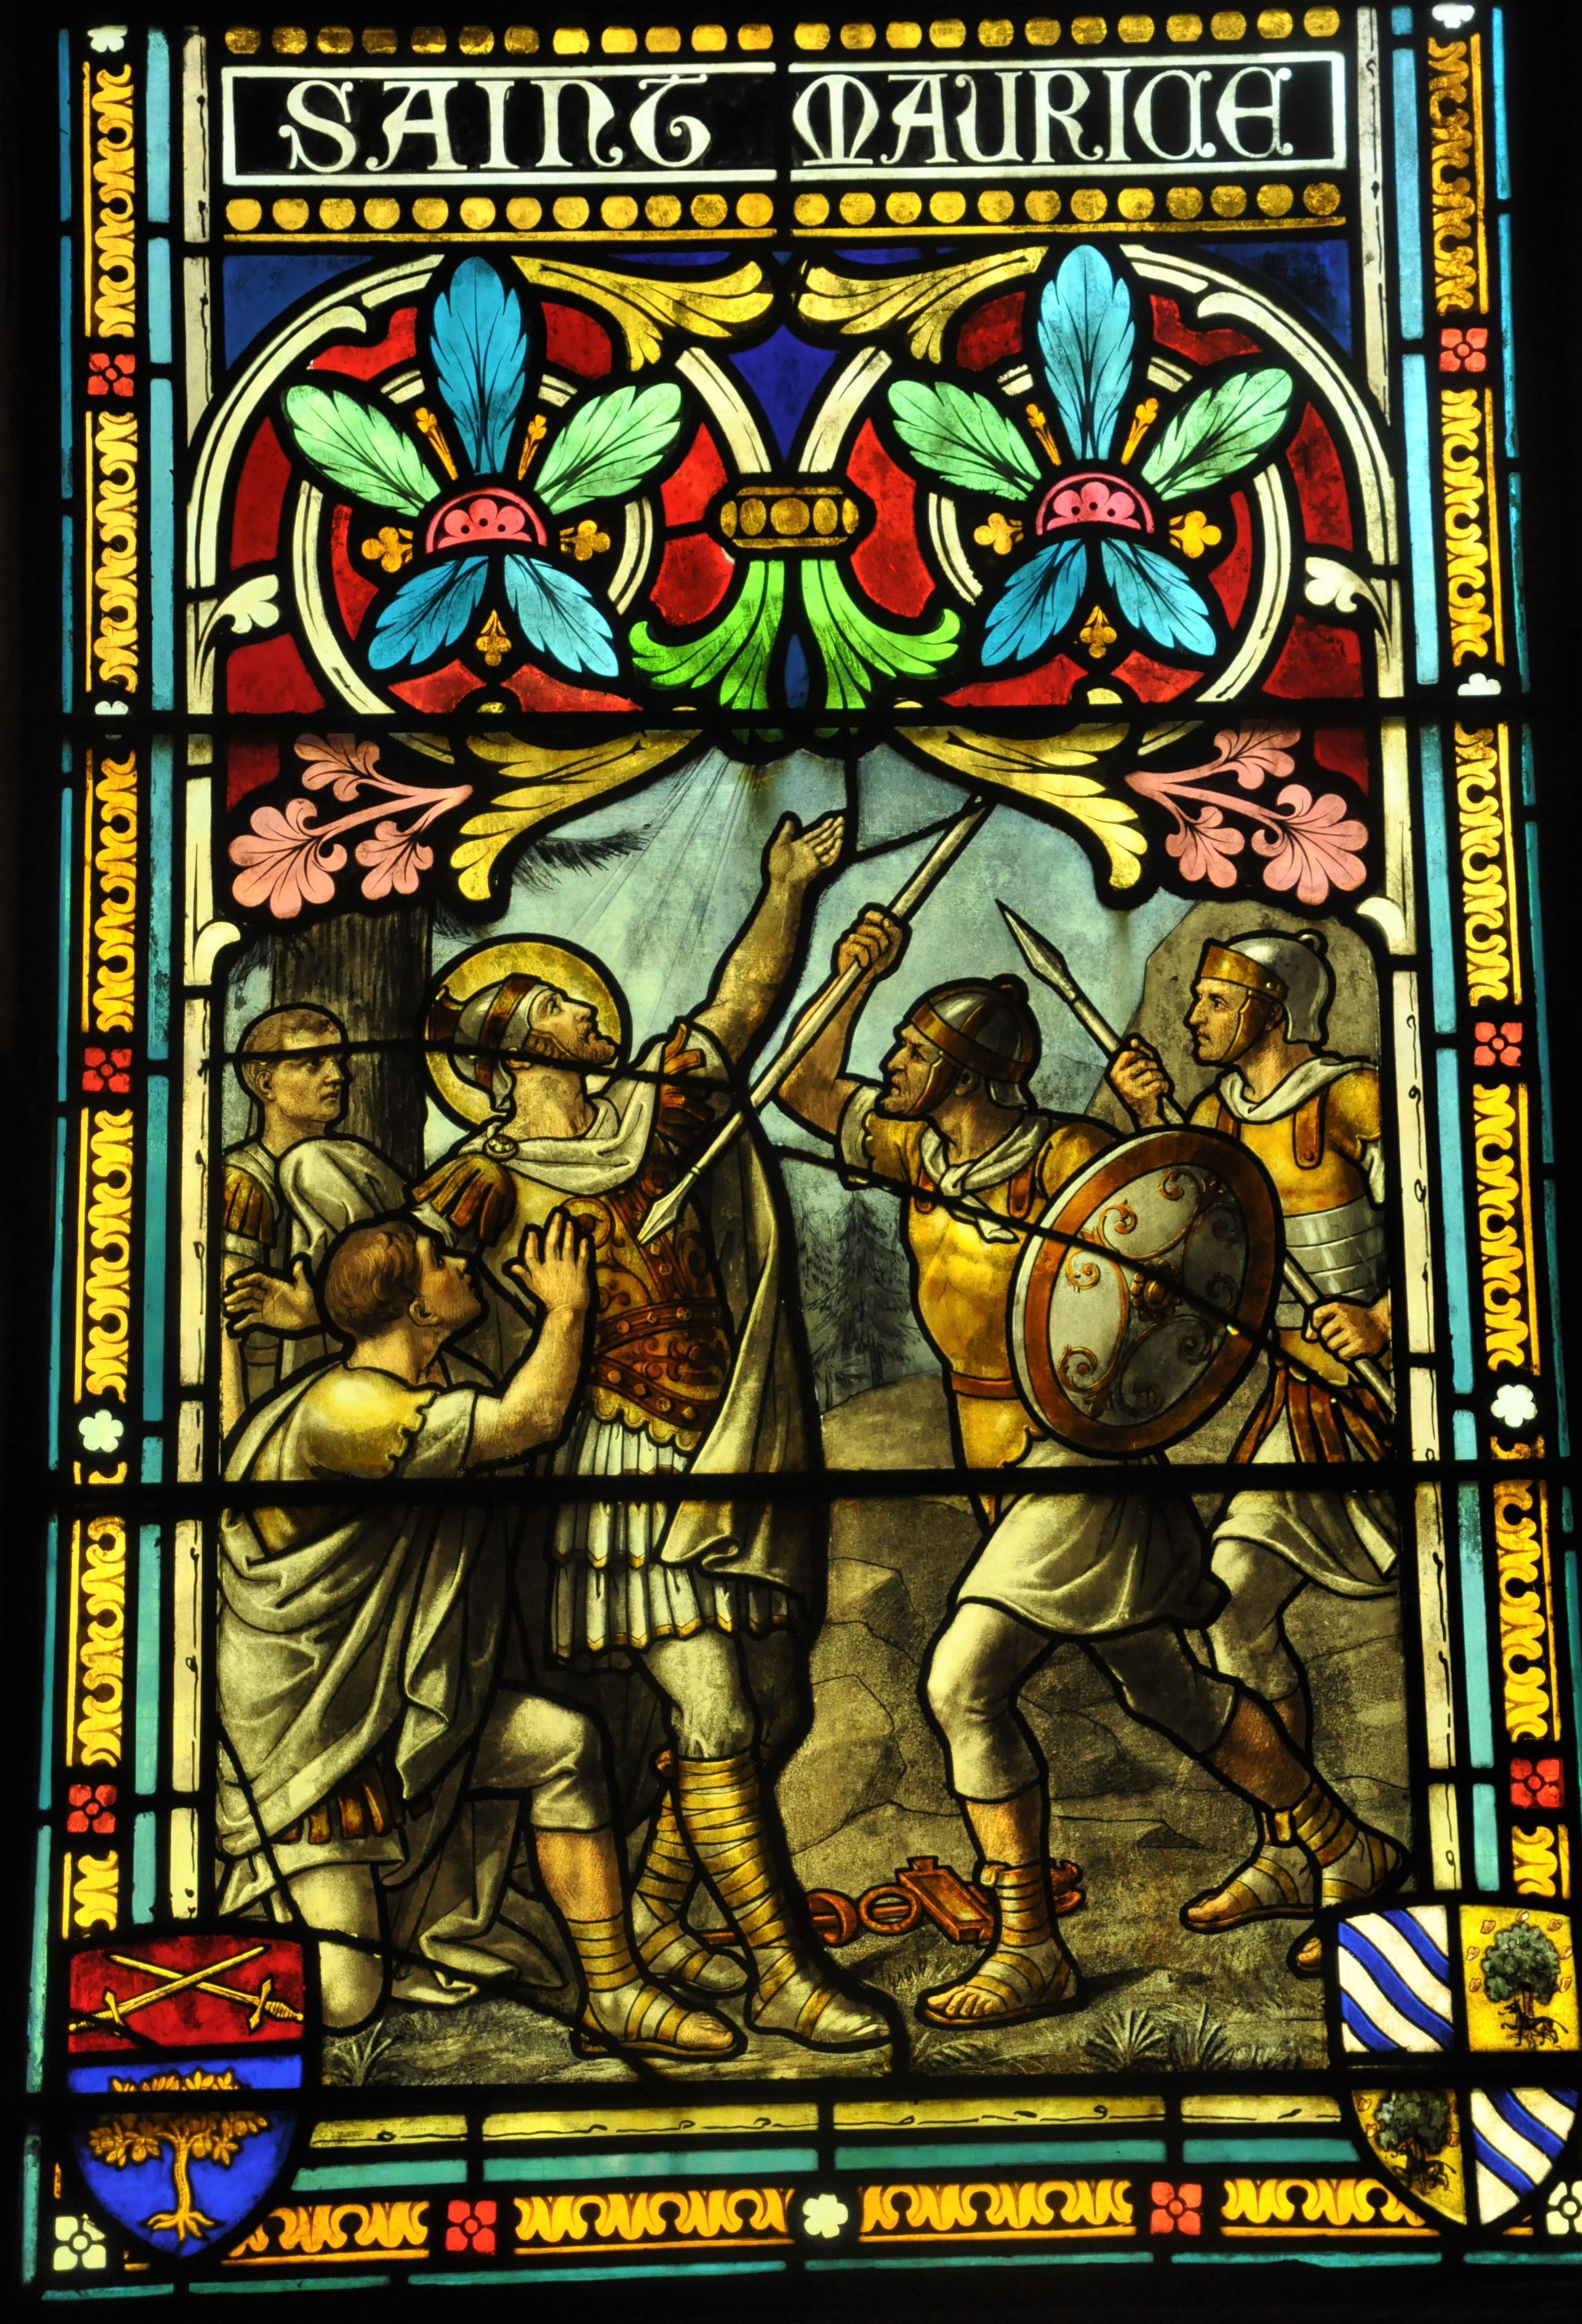 Soubassement vitrail Saint-Maurice